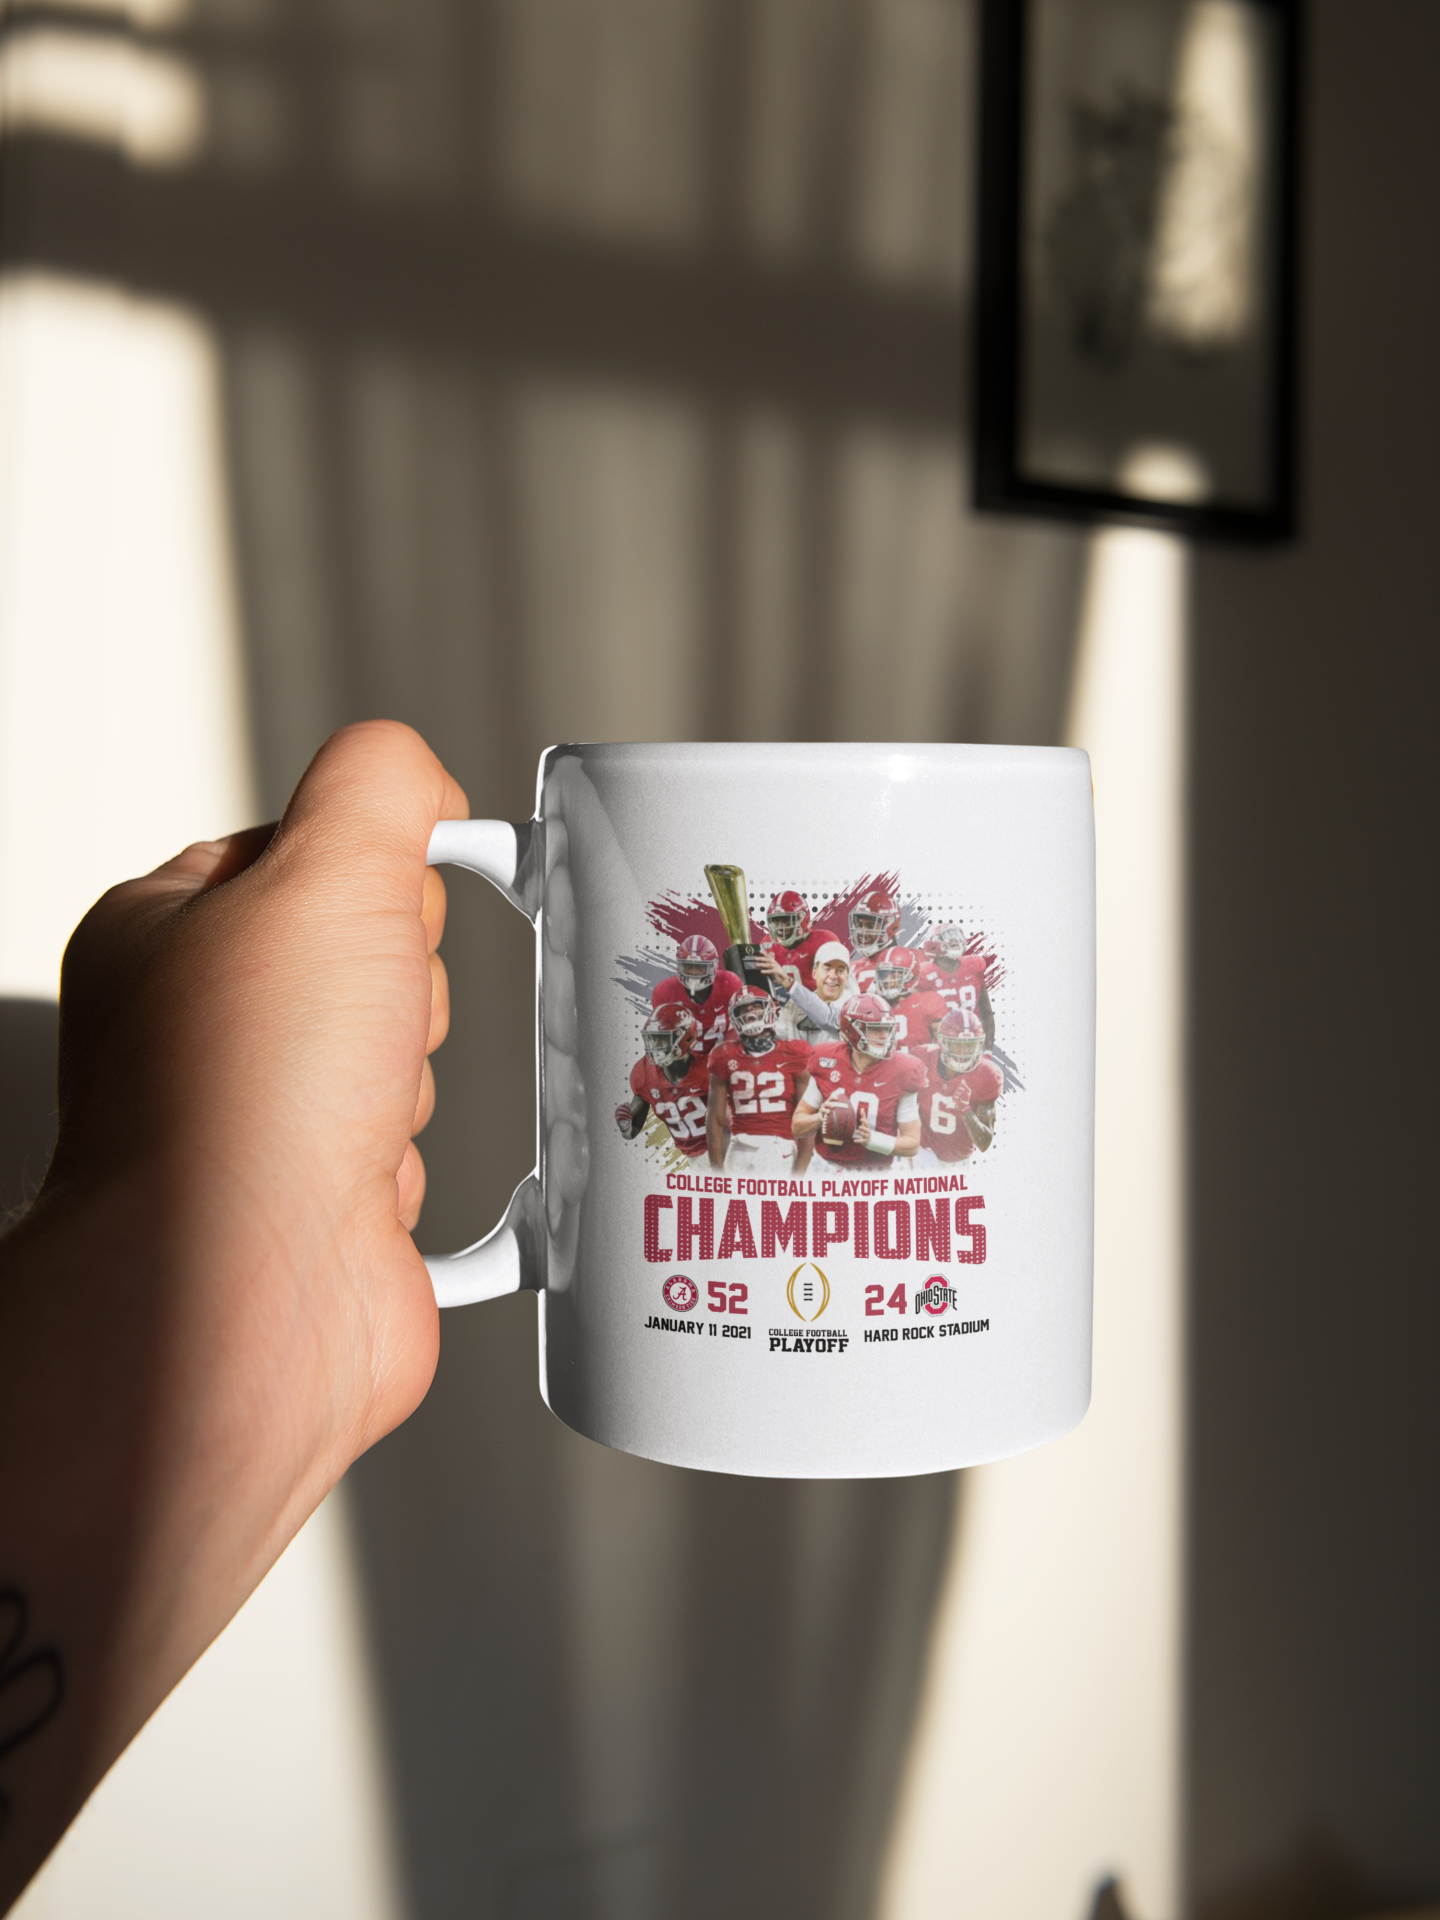 College football playoff national championship mug